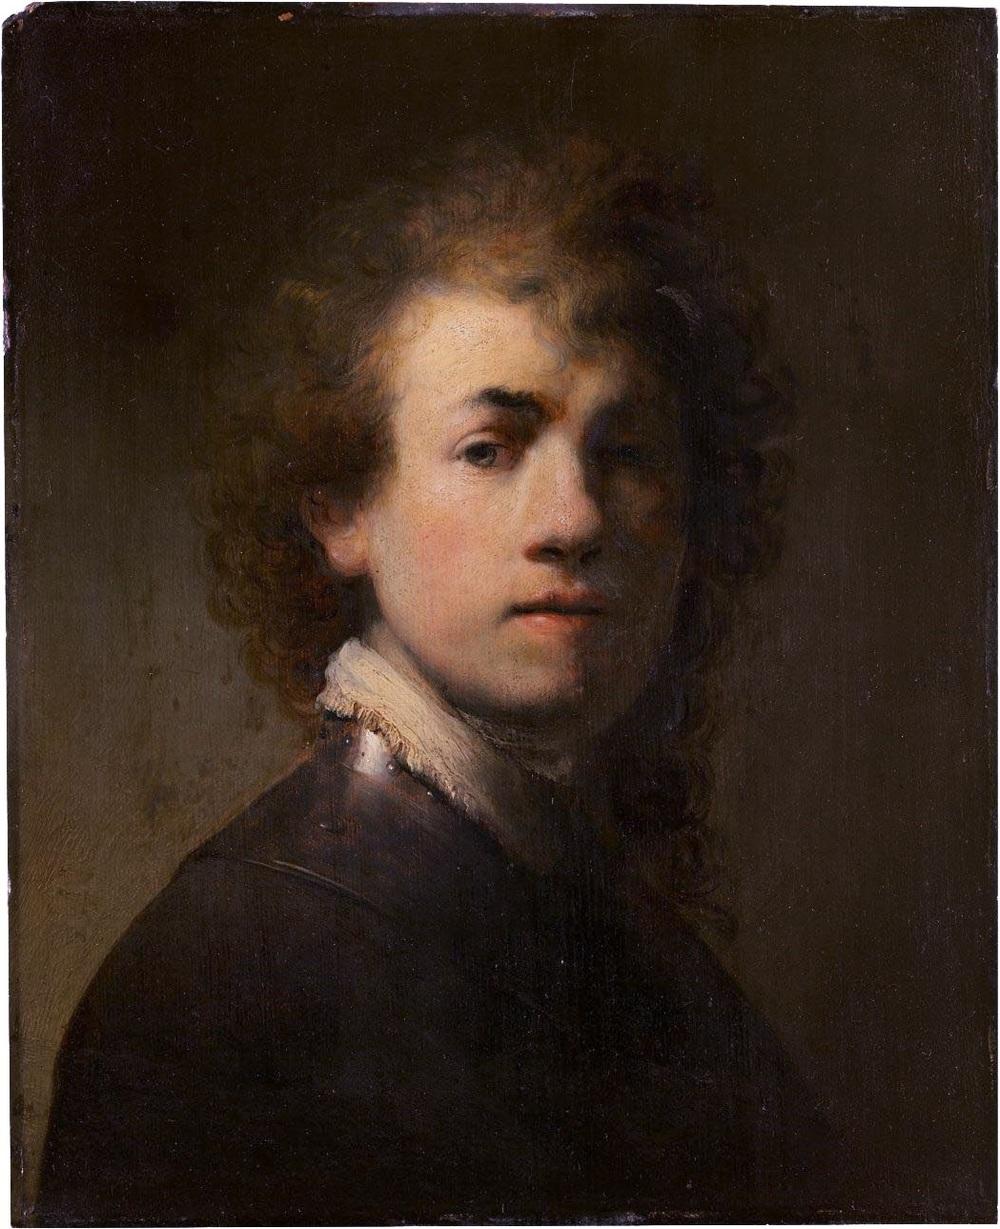 Rembrandt van Rijn, Self-Portrait, 1629, Oil on canvas